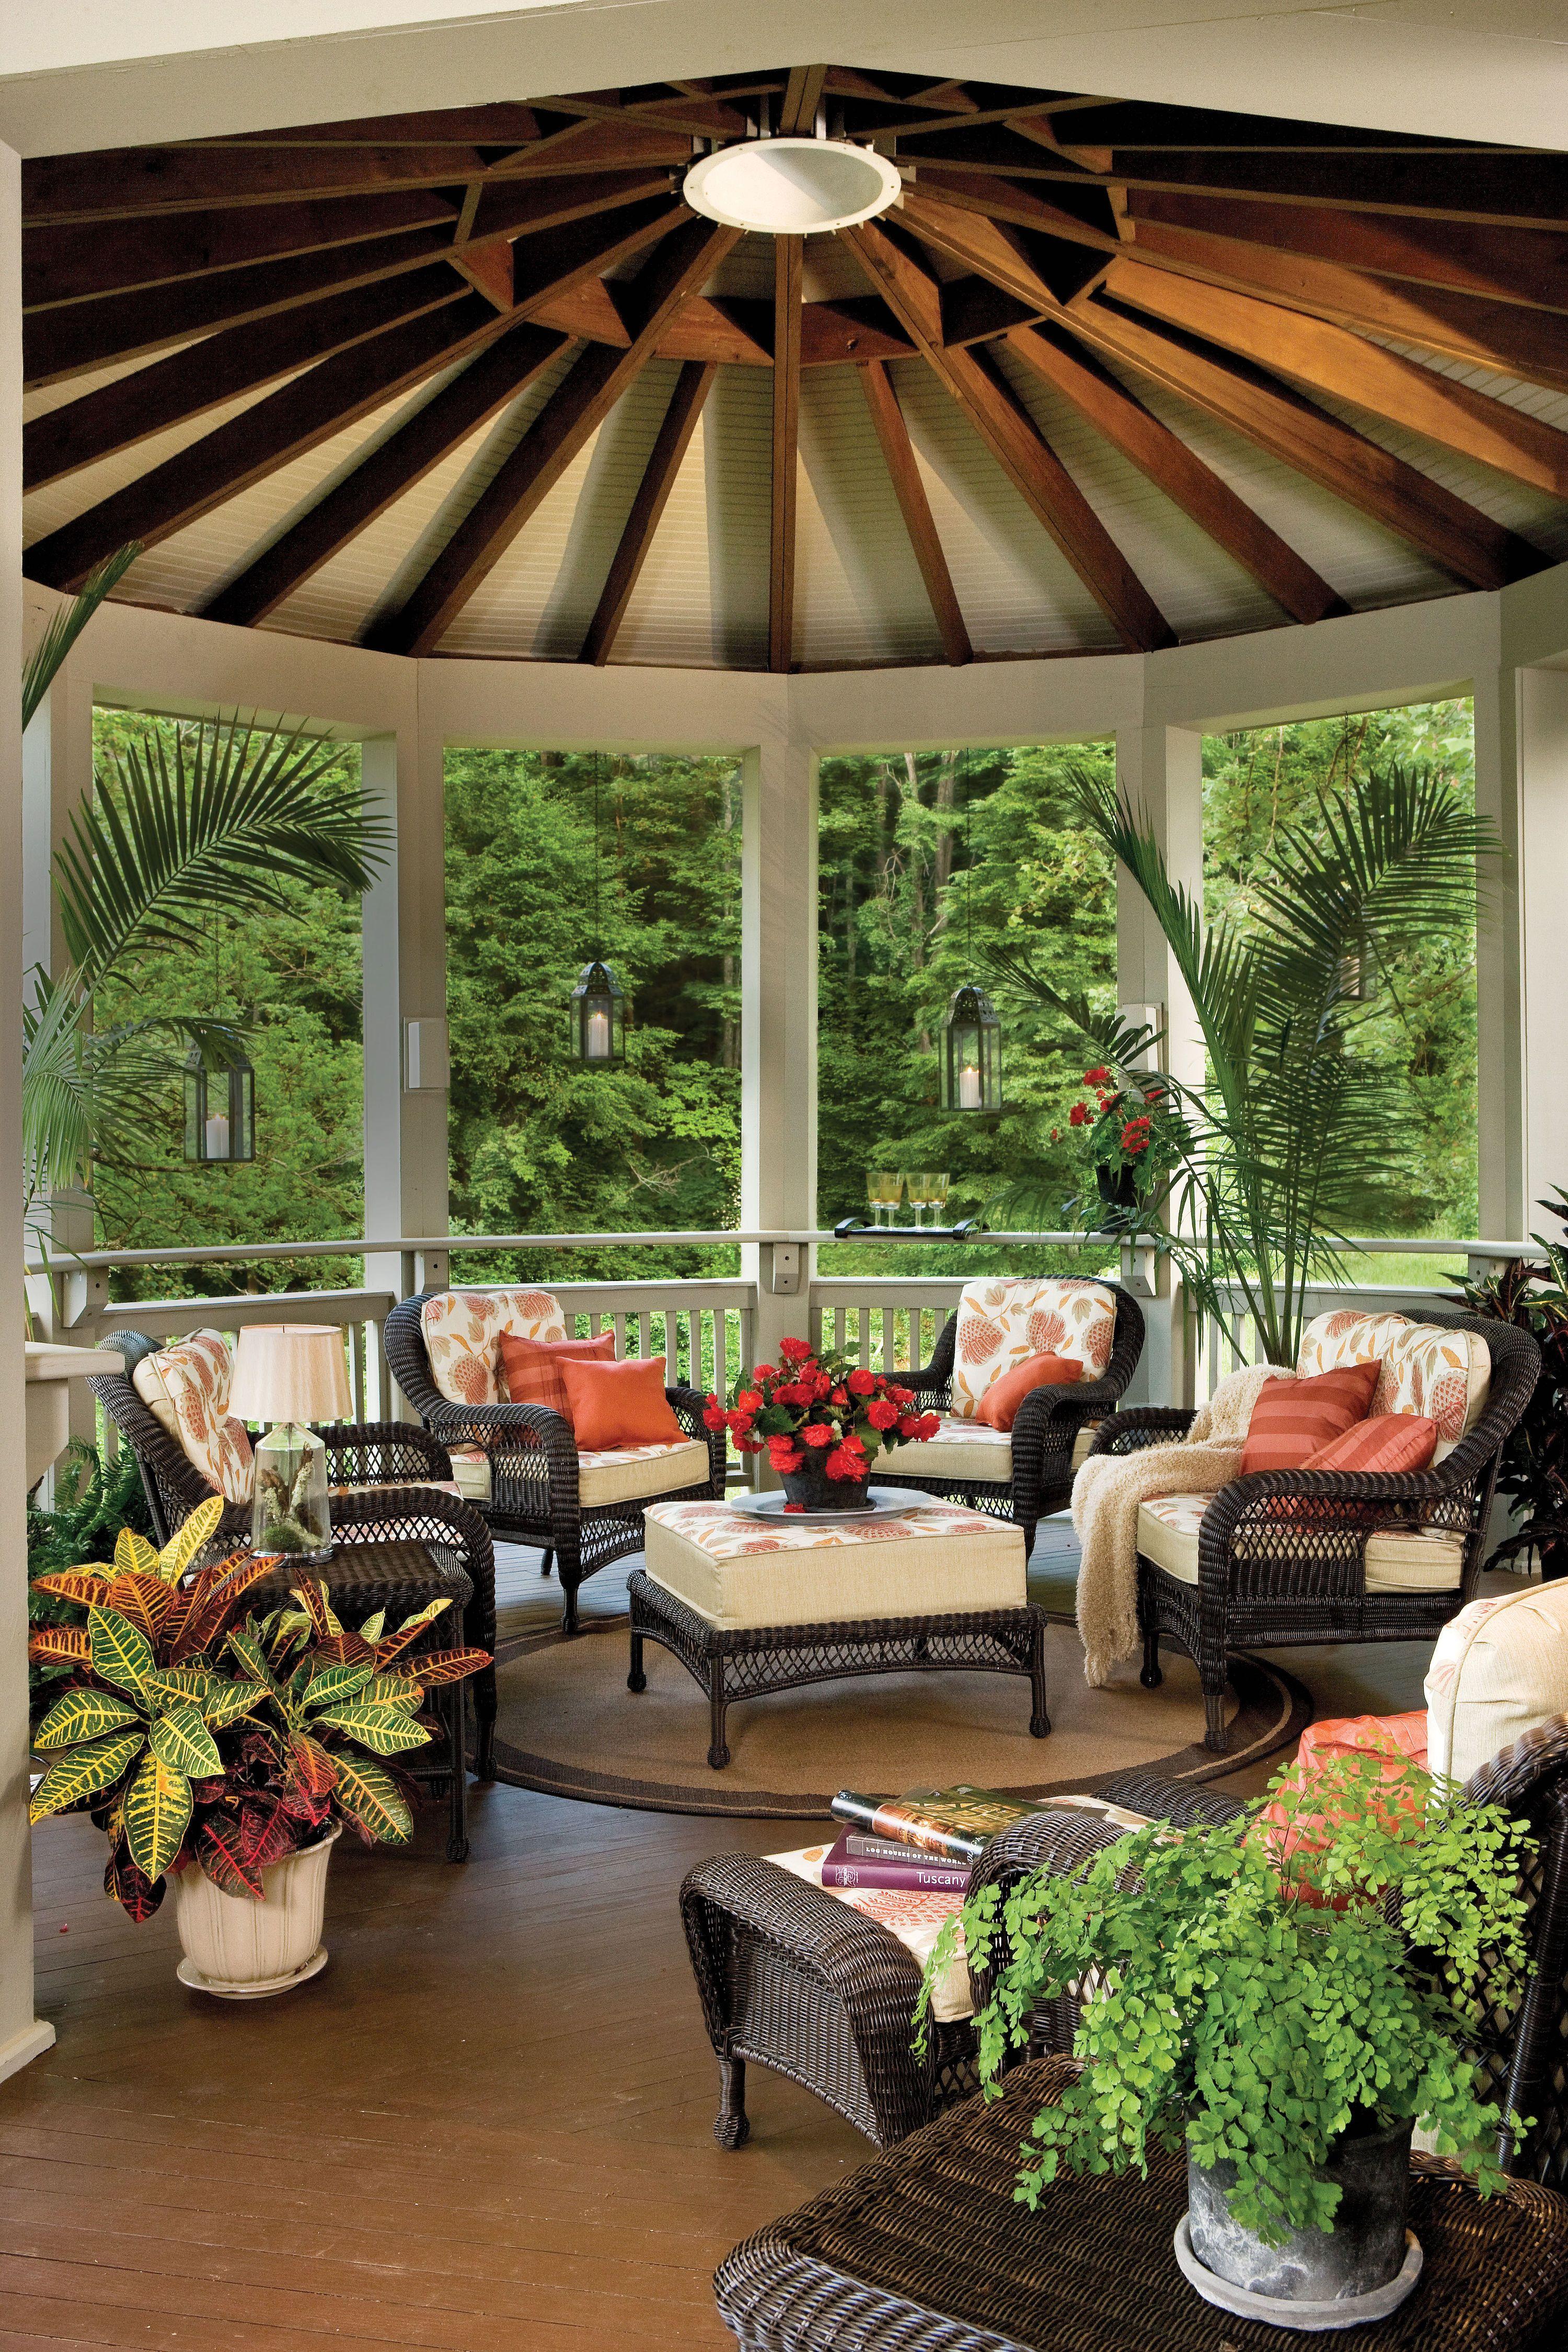 Appalachian Round Porch Patio Pinterest